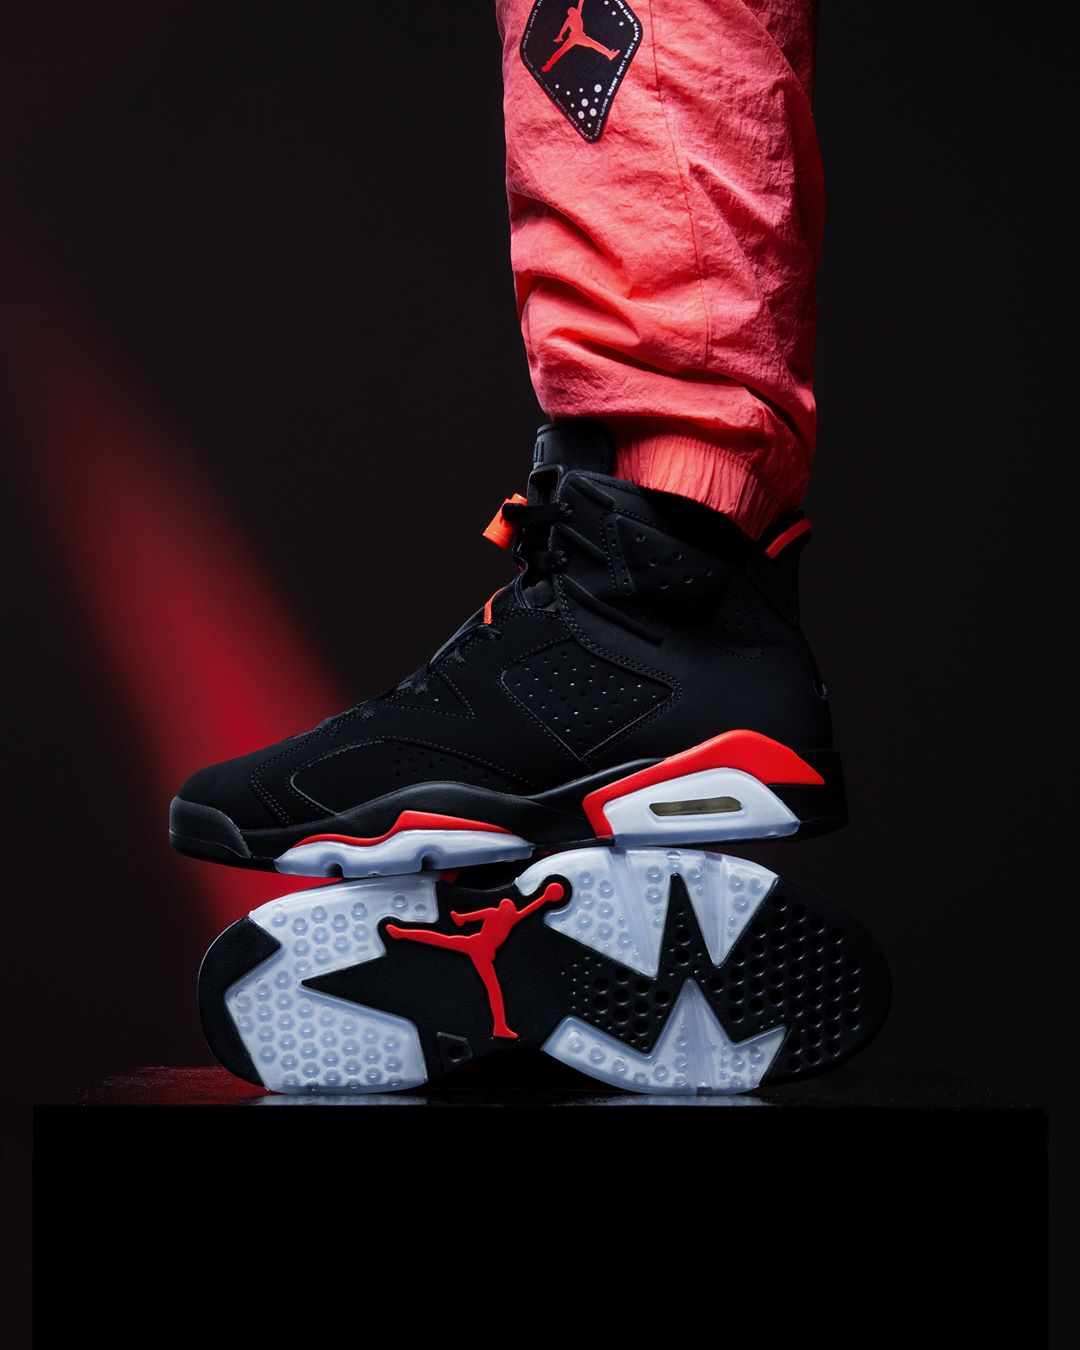 Air Jordan,AJ  黑红 AJ4 市价破 3K!元年 AJ 悄悄起飞!最冷门的都翻了三倍!